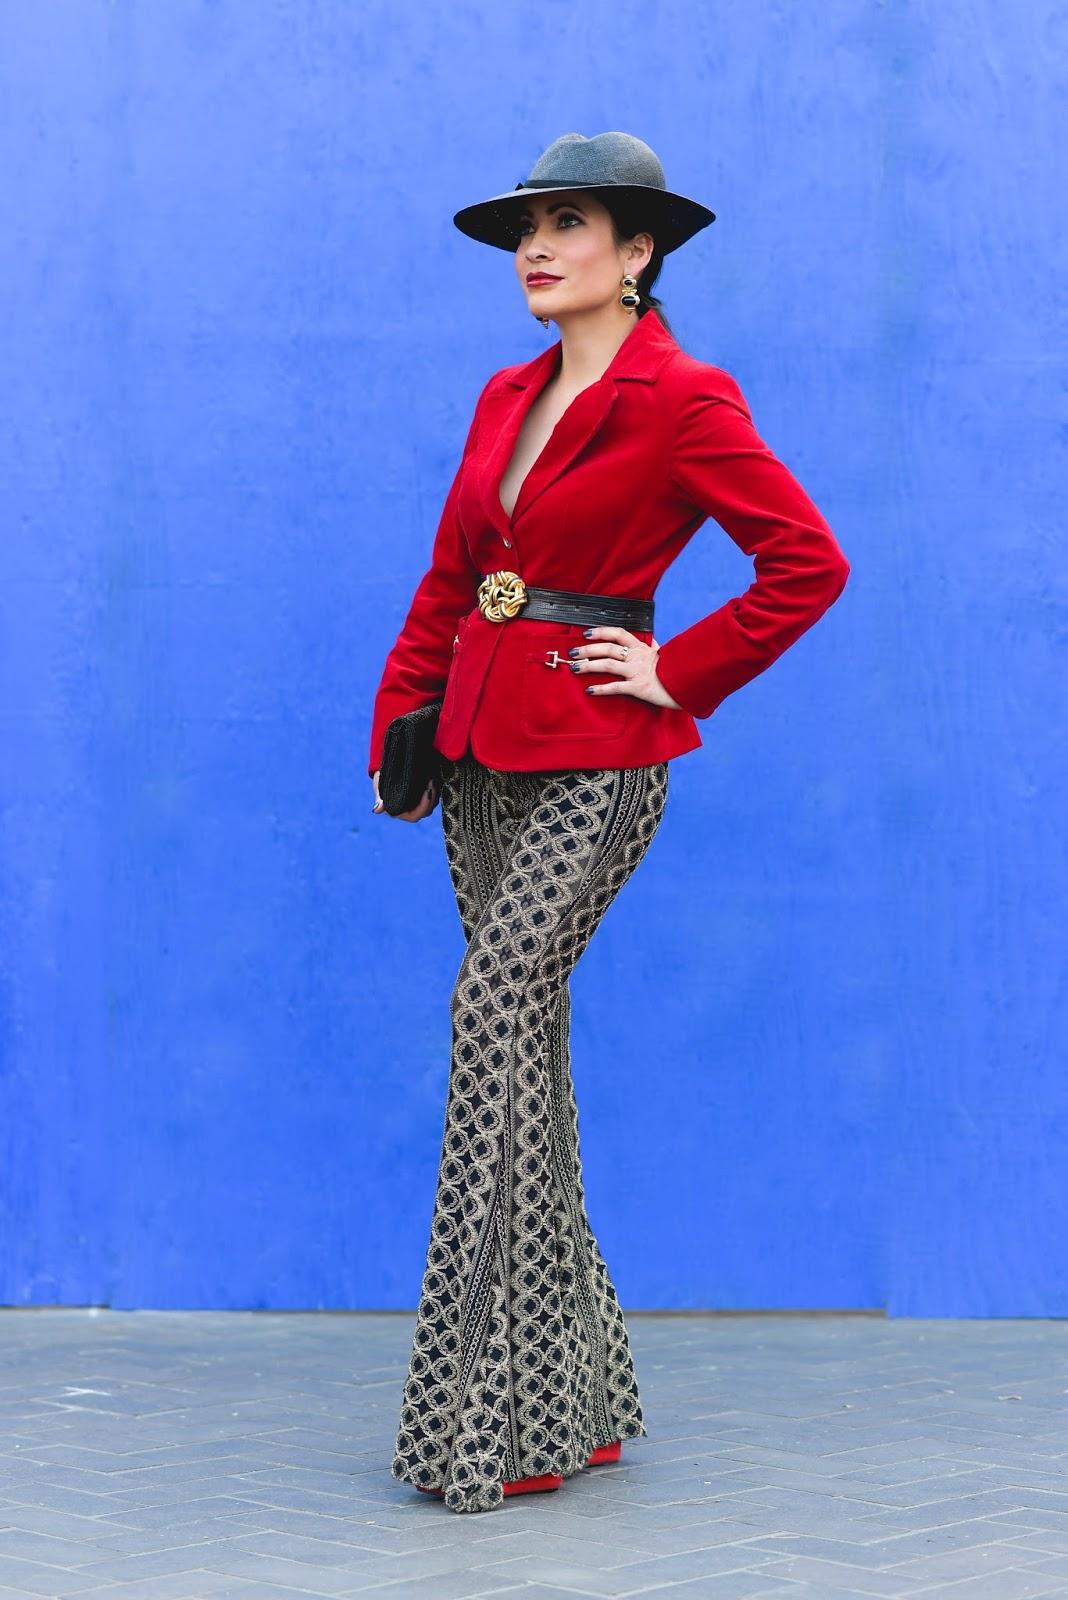 Vintage black hat honey punch gold and black sheer flare pants red talbots  corduroy blazer black 427b2170a4bb